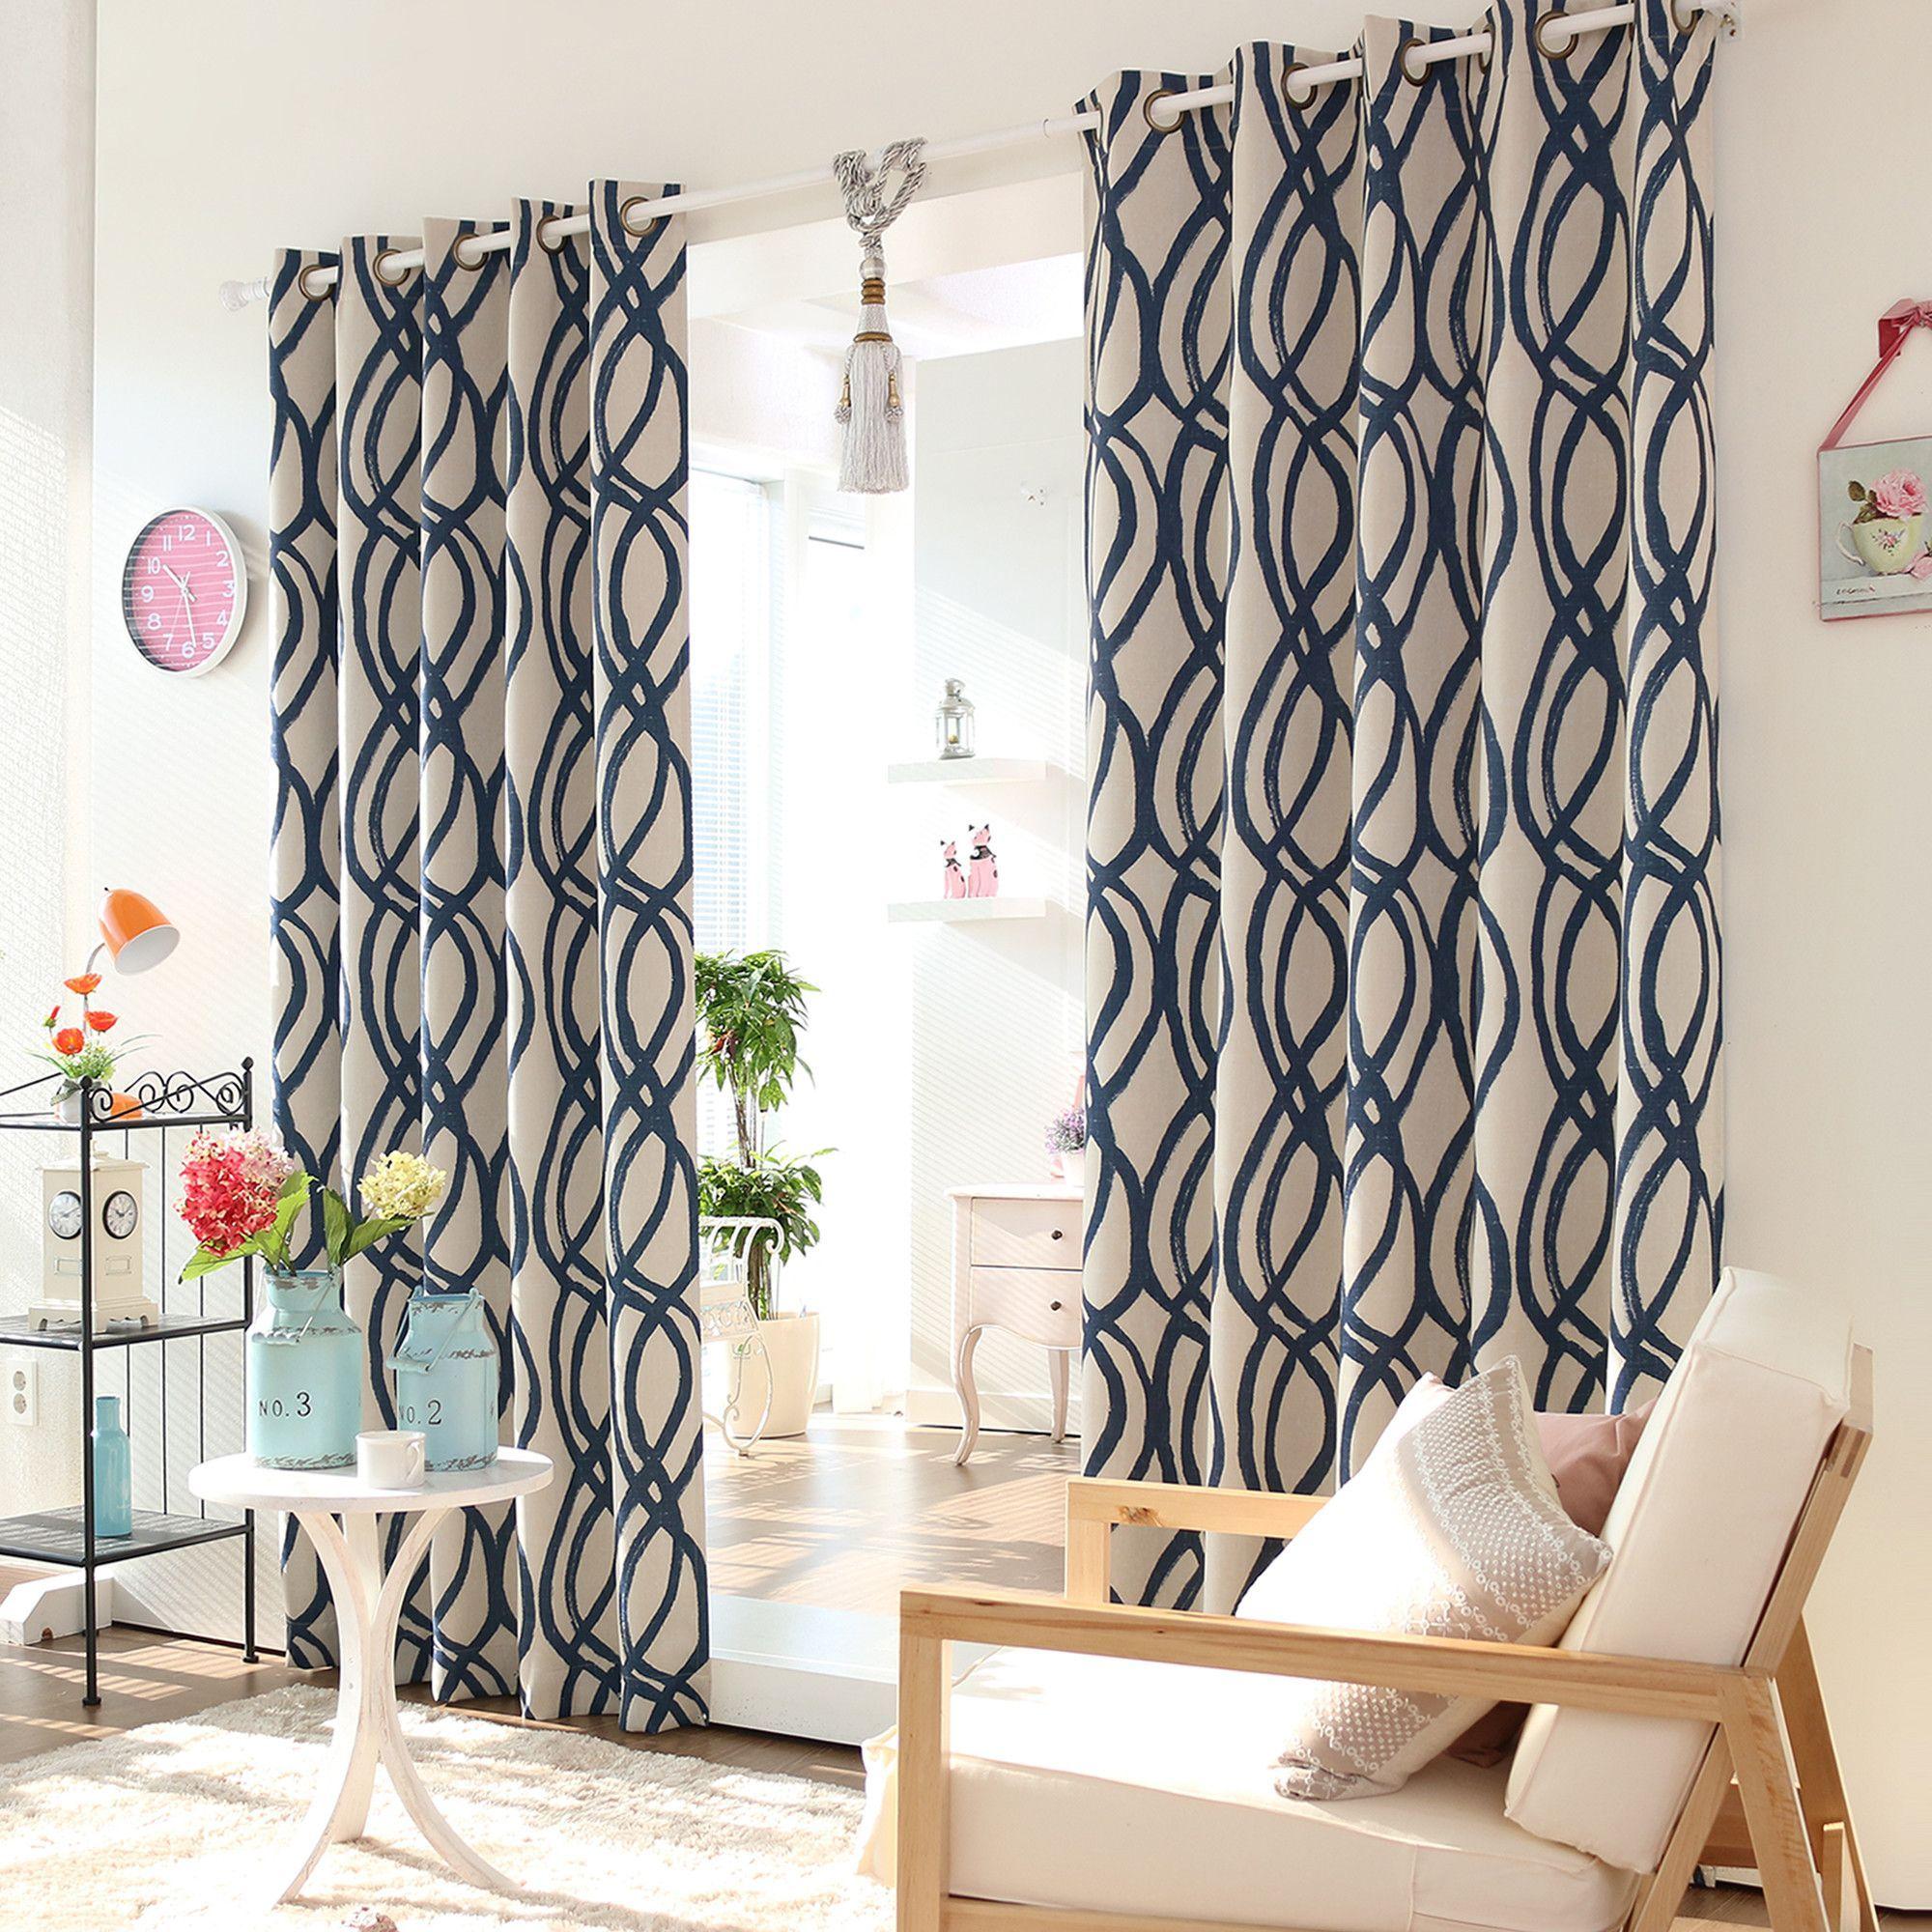 Best Home Fashion Inc Wave Room Grommet Top Darkening Curtain Panels Reviews